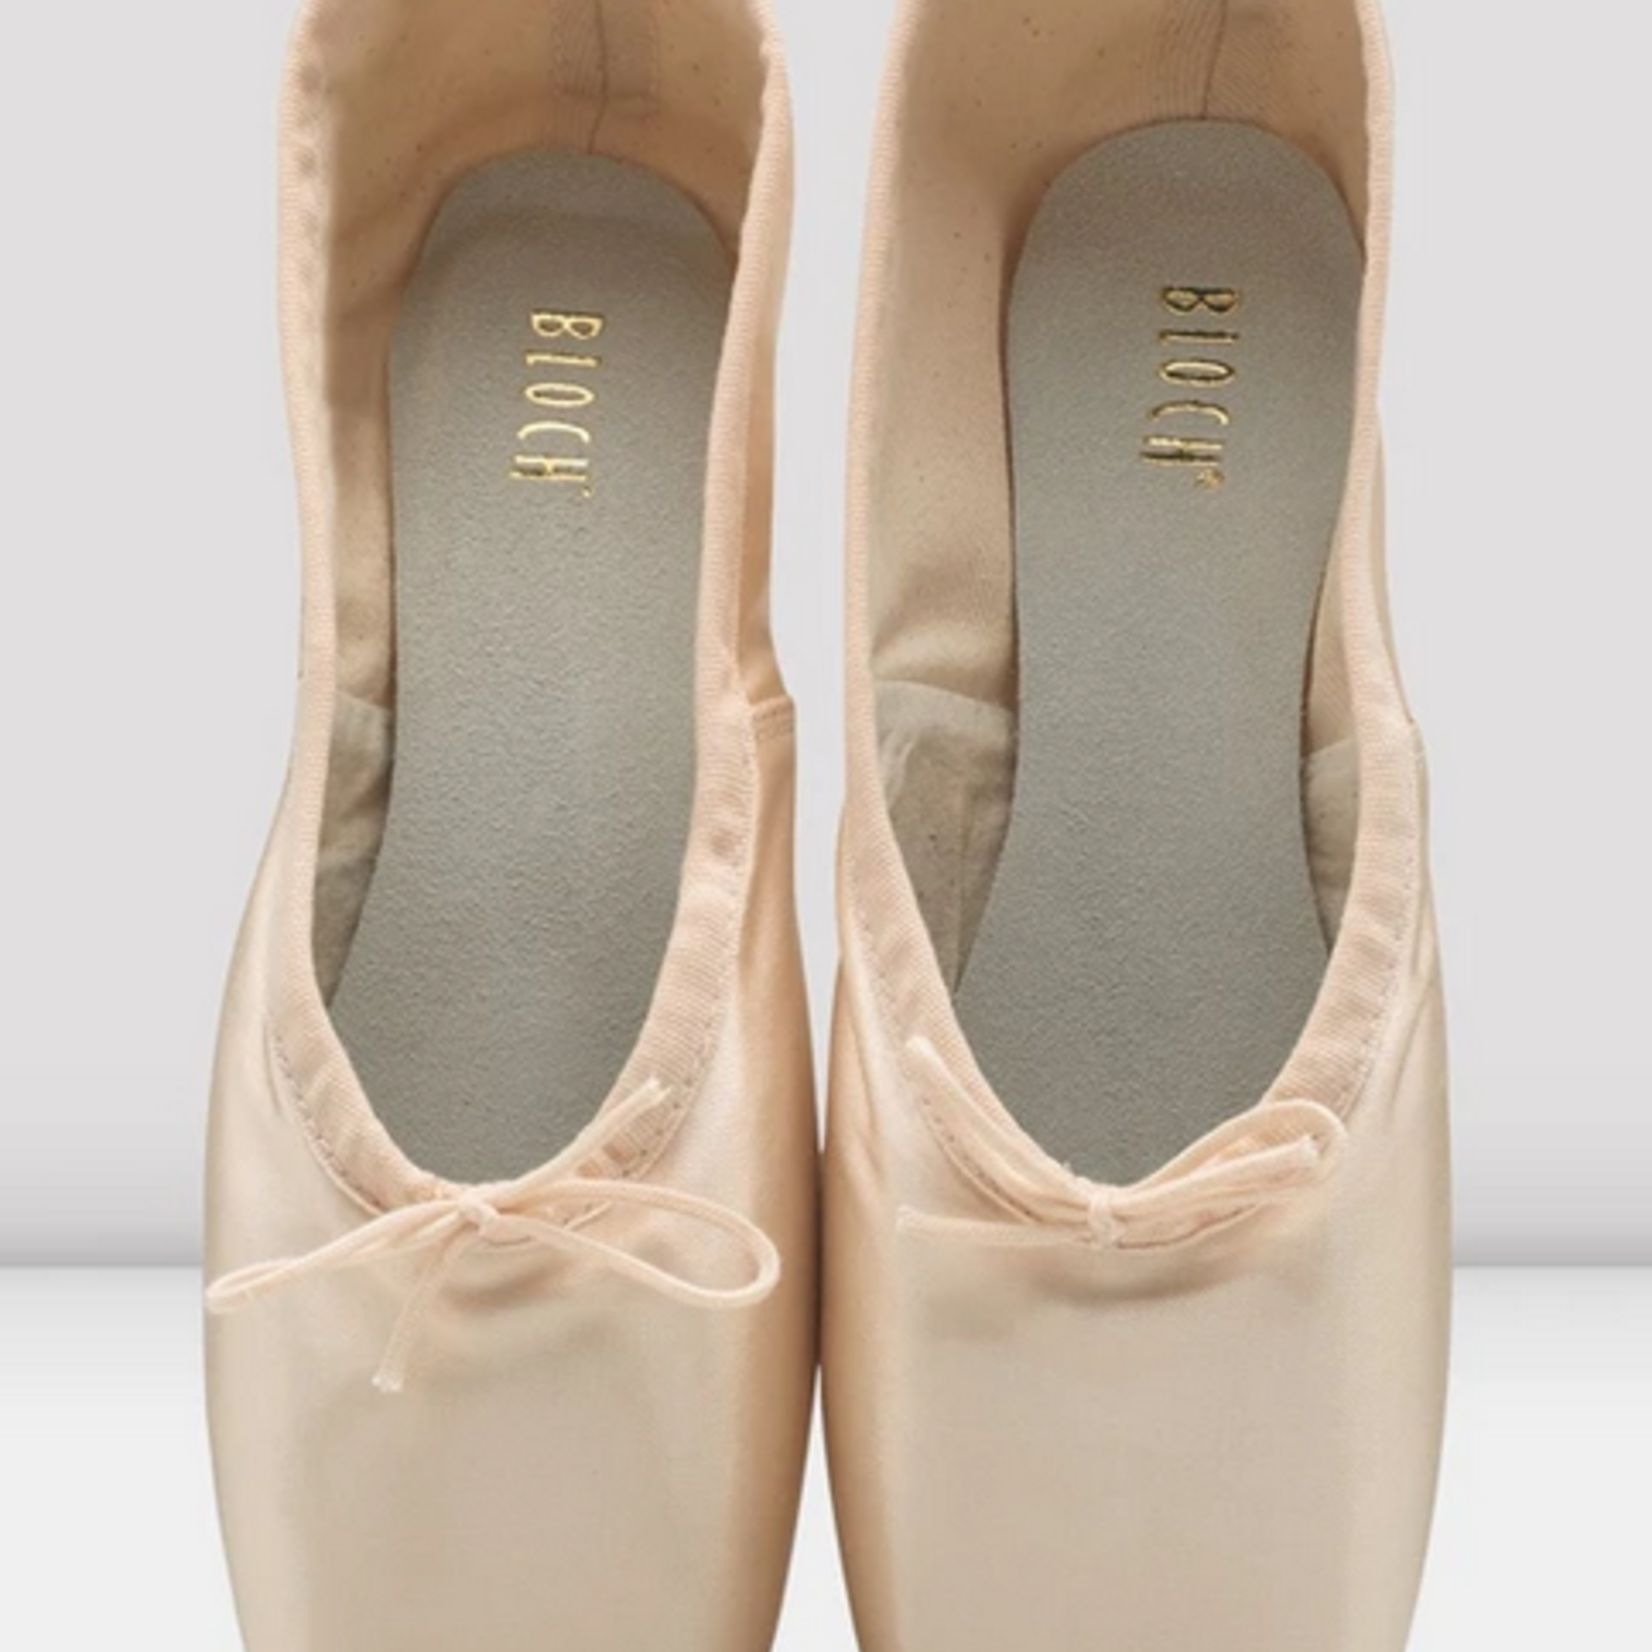 Bloch Bloch S0131S Serenade Strong Pointe Shoe